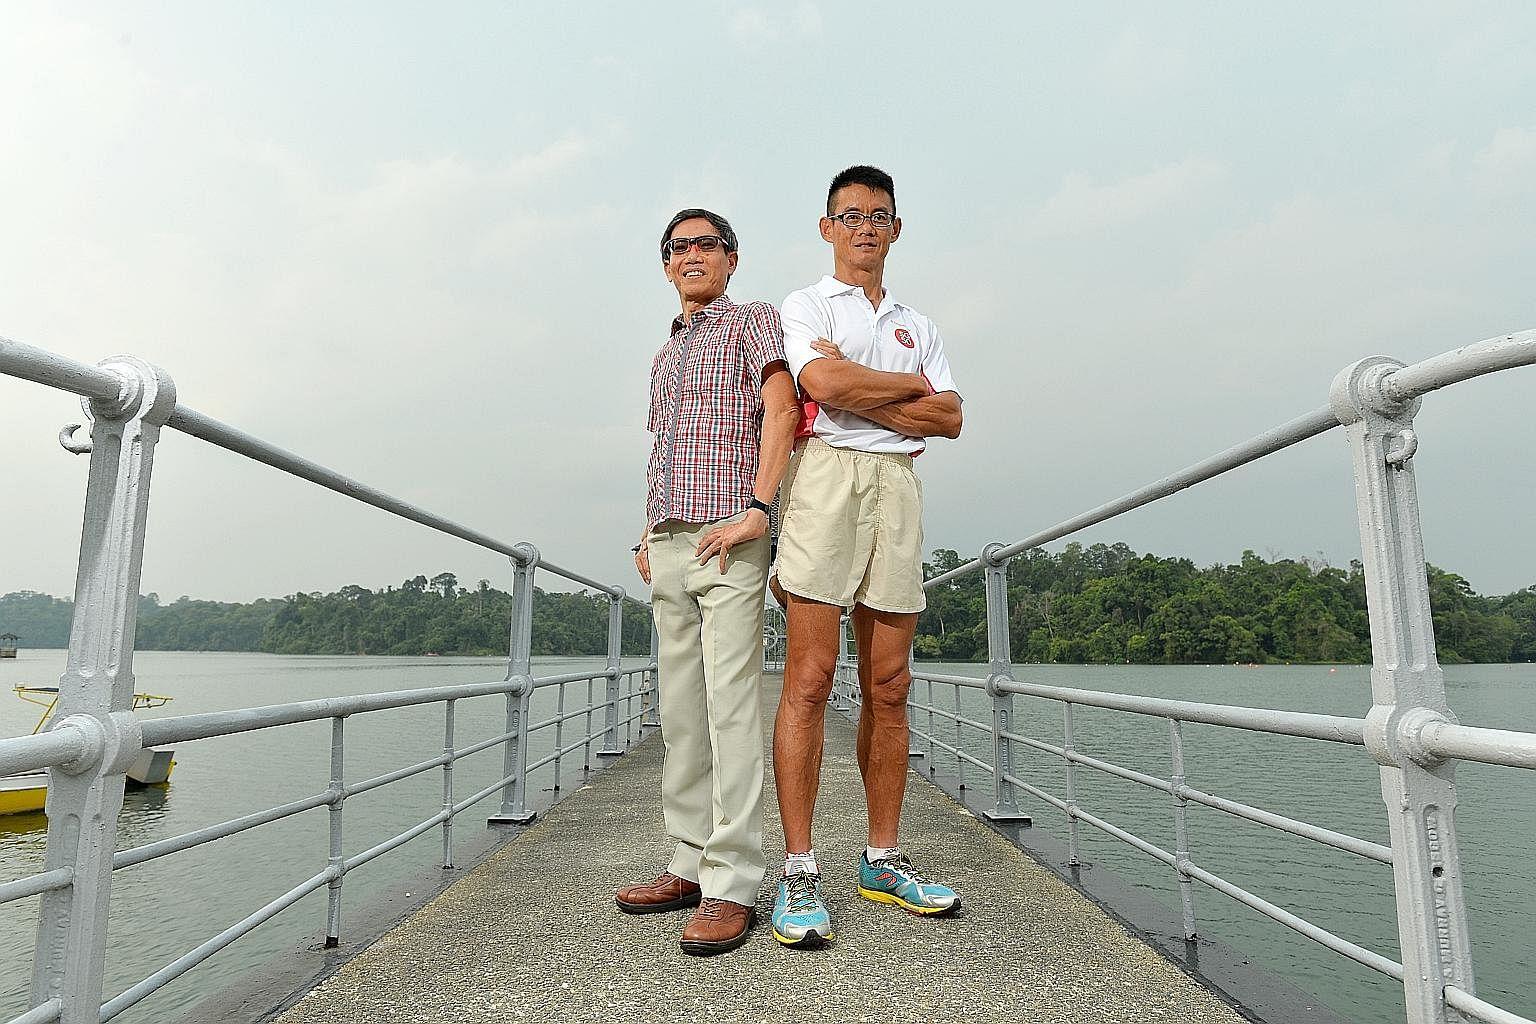 Ultramarathoners Lim Nghee Huat (left) and Yong Yuen Cheng ran 2,500km in 50 days to mark Singapore's jubilee.